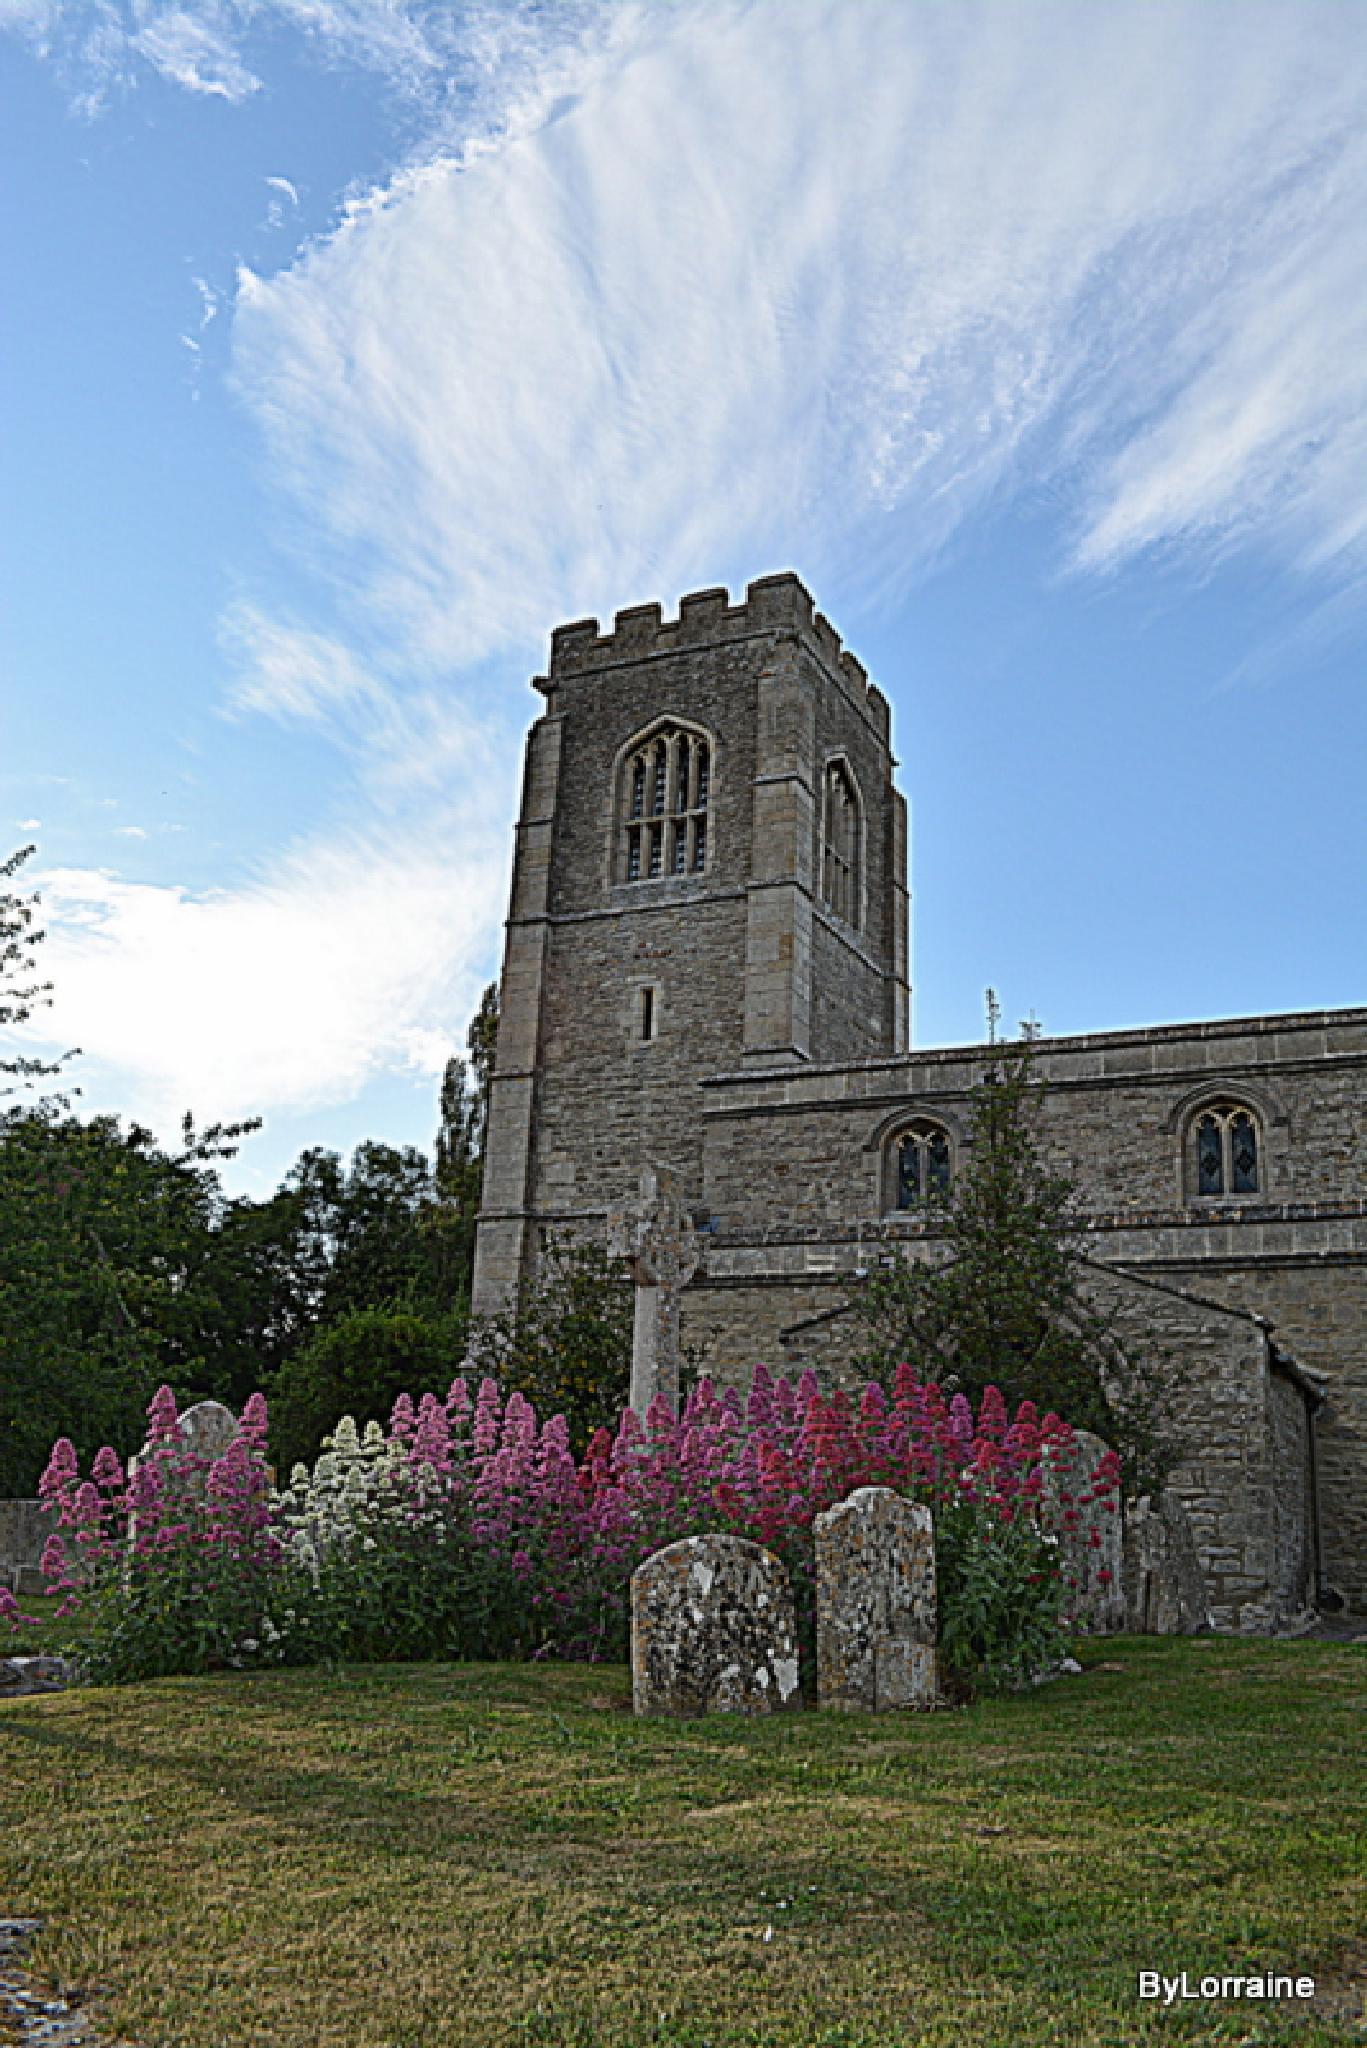 Village Church by Lorraine. Sgt